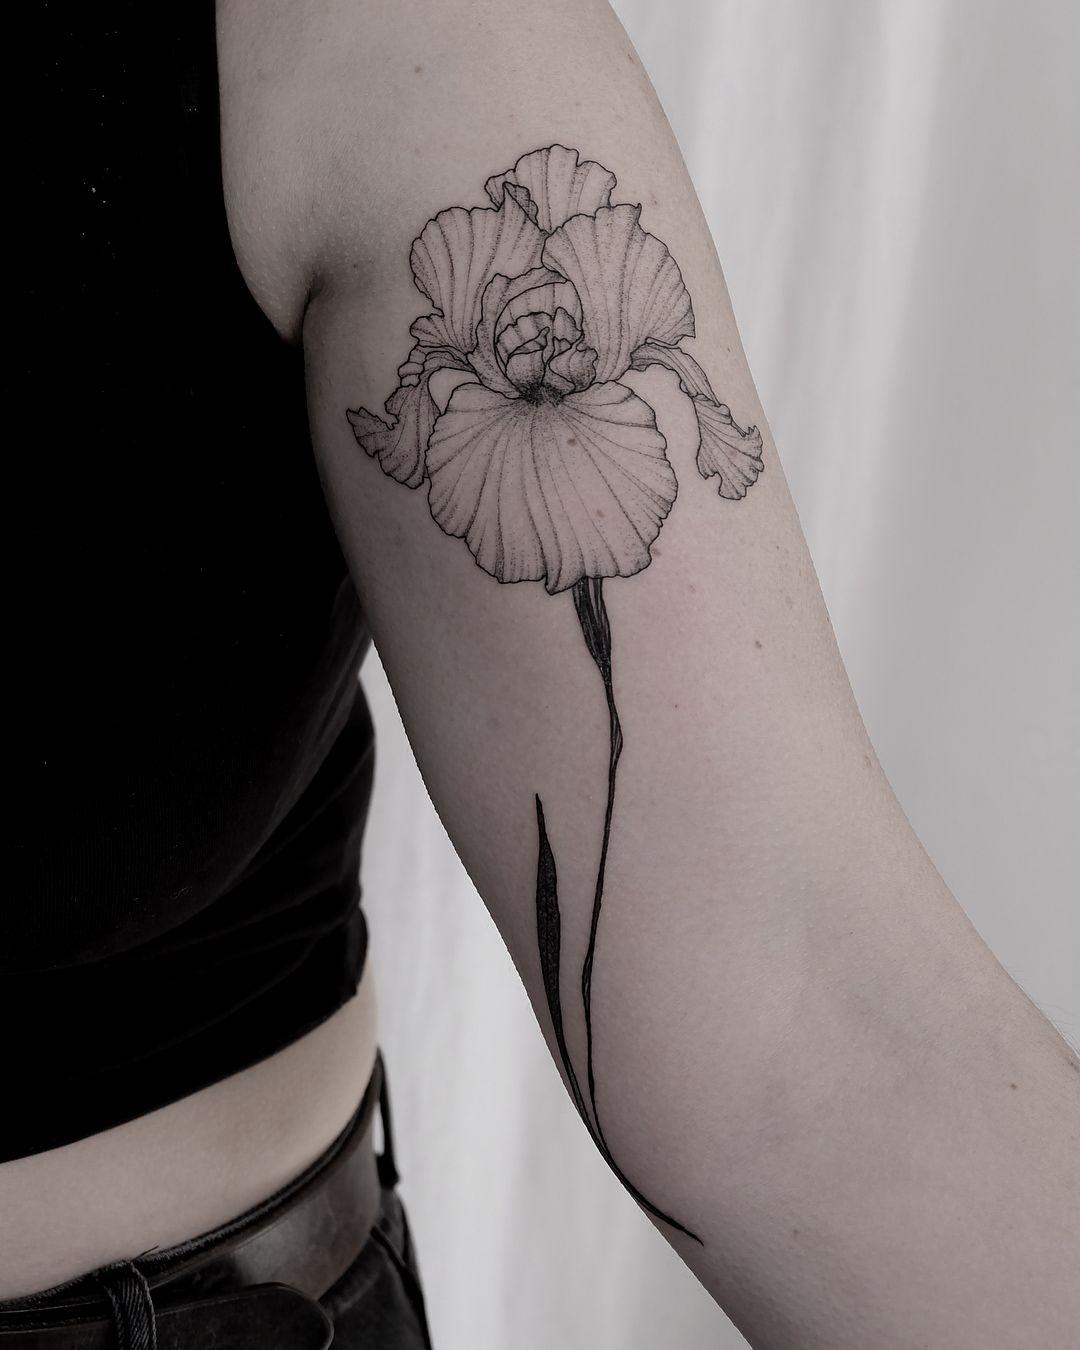 Forearm flower tattoo designs 2020